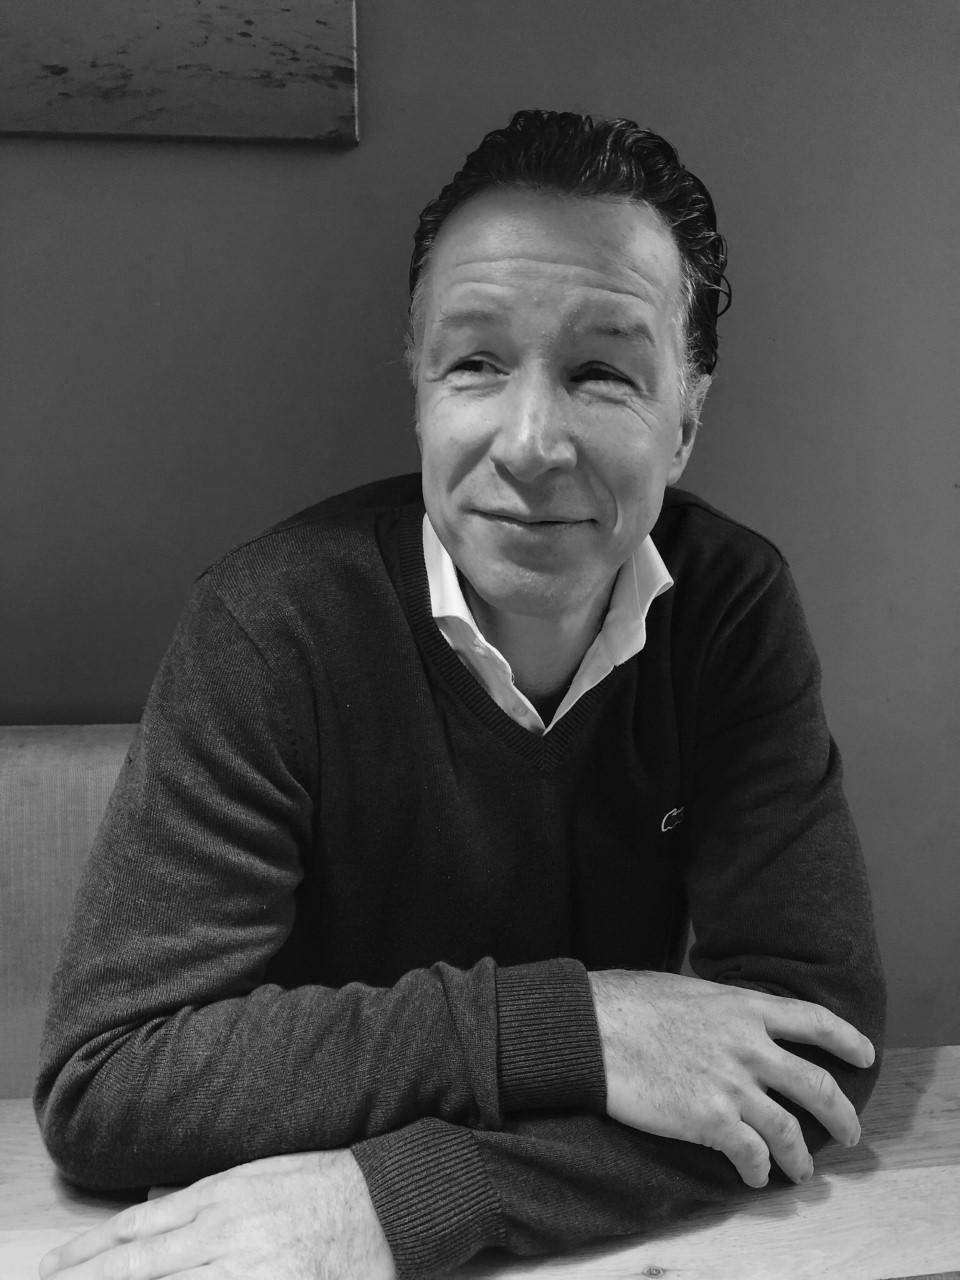 Michael Jansen